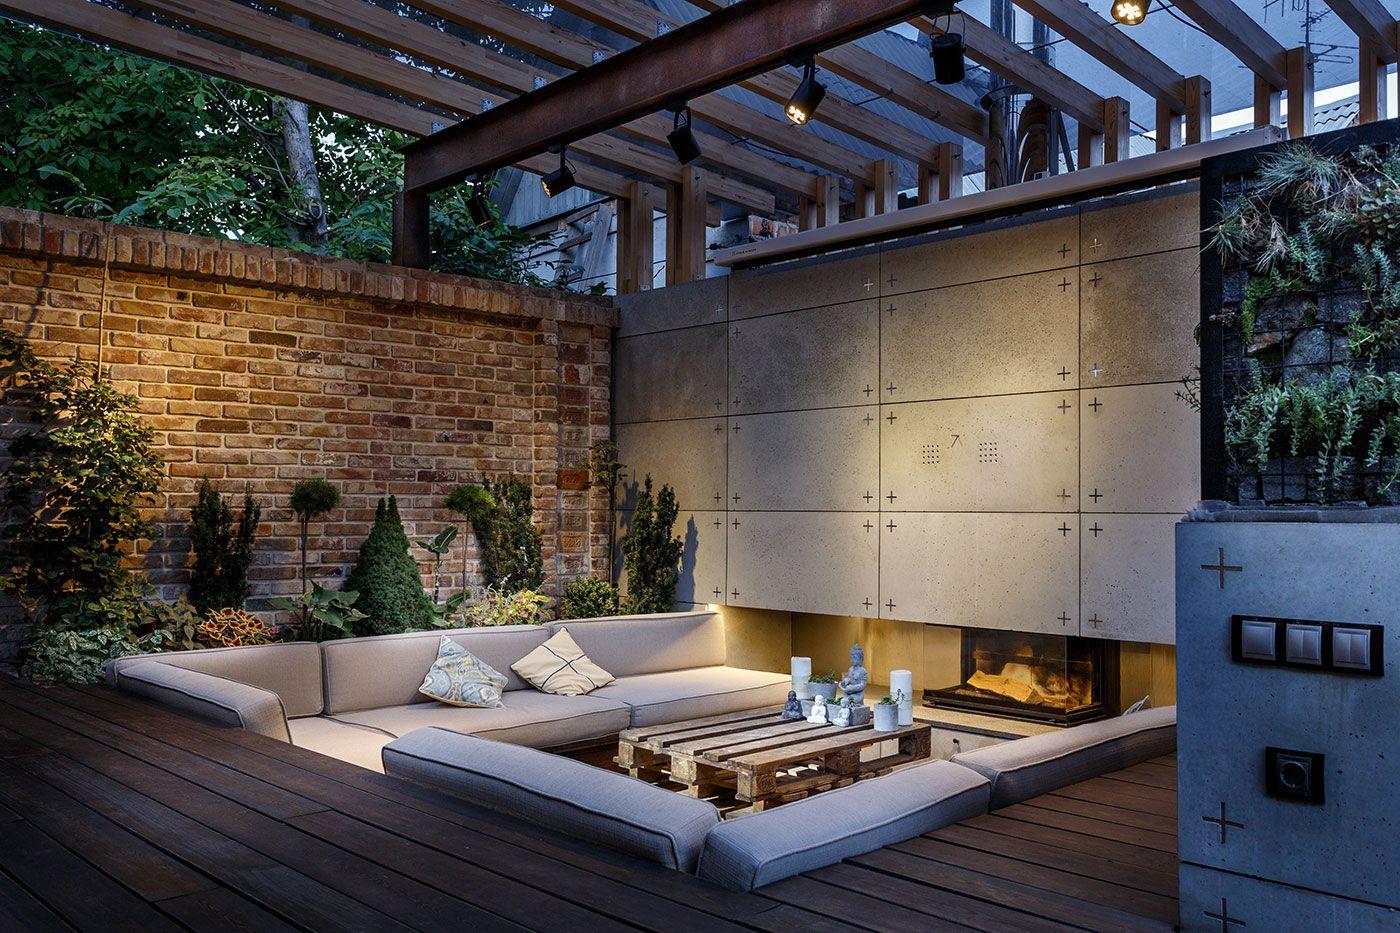 5 Lounge Dakterrassen : Svoya studio sunshade tent outdoor lounge